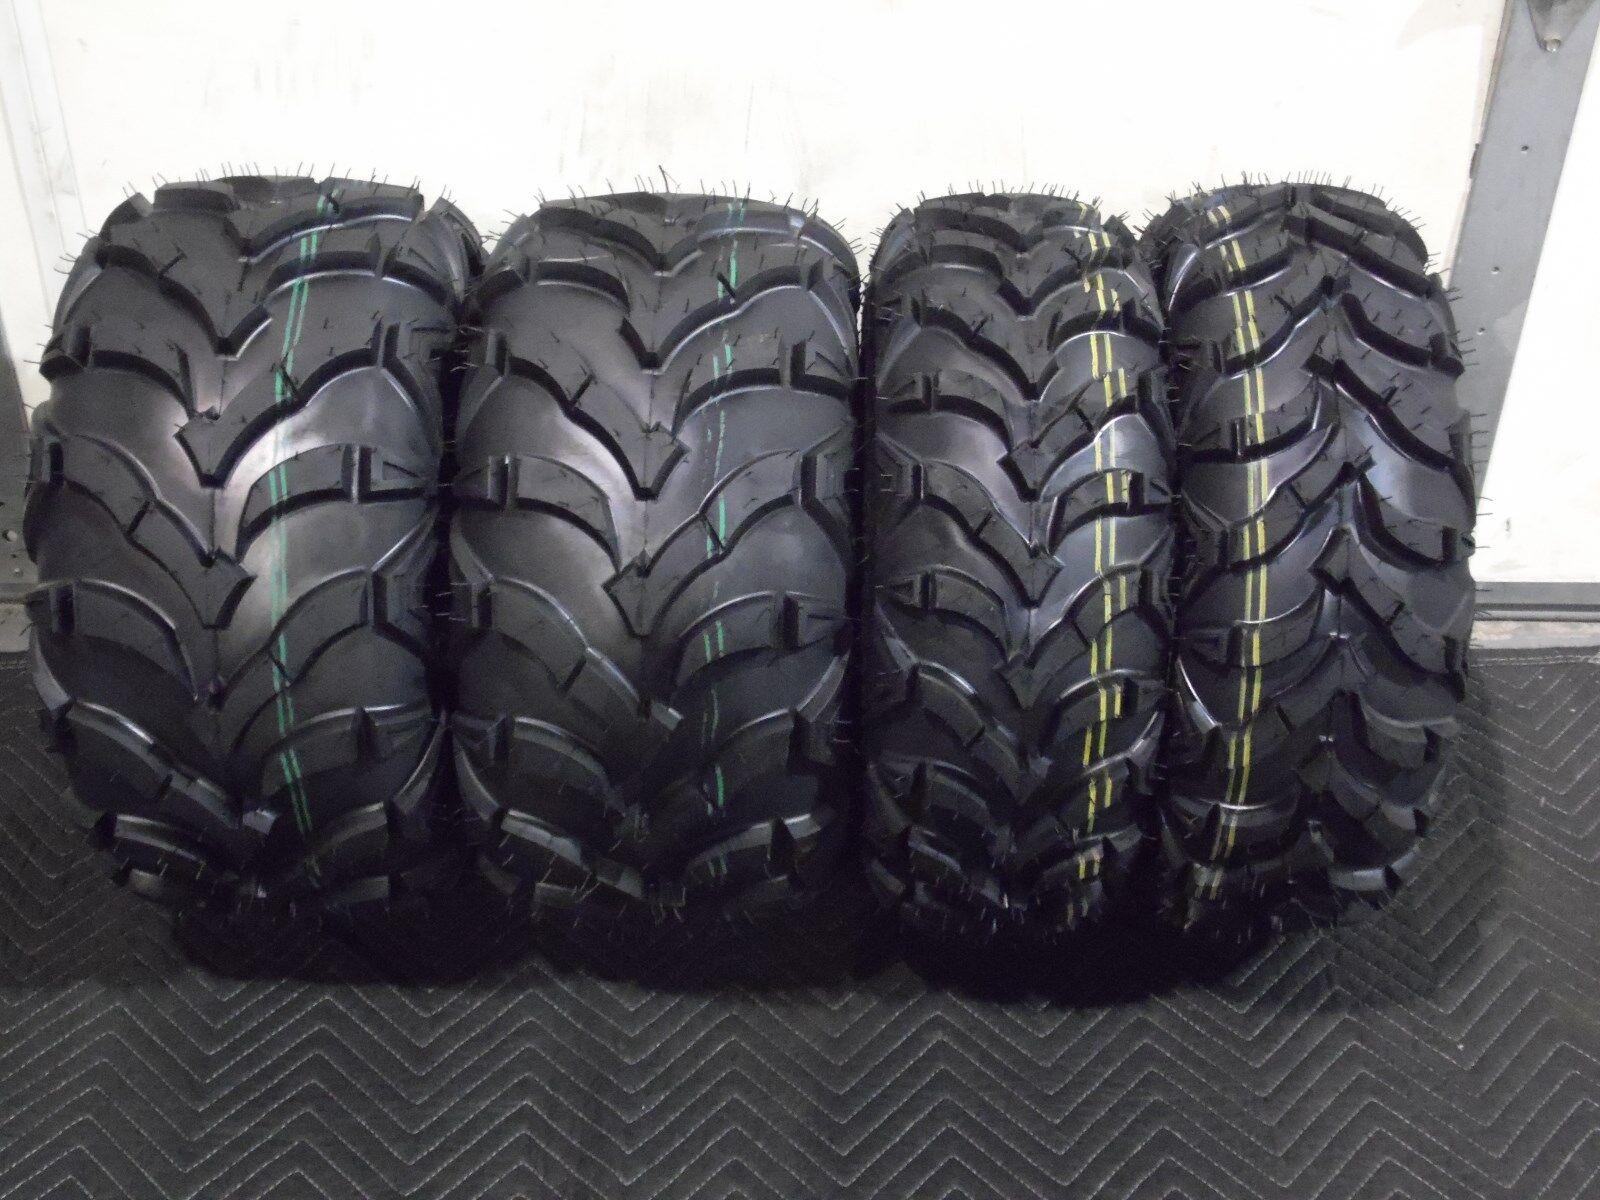 suzuki ozark atv tires complete set 4 tires 22x7 11 22x10 9 quadking 6 ply ebay. Black Bedroom Furniture Sets. Home Design Ideas